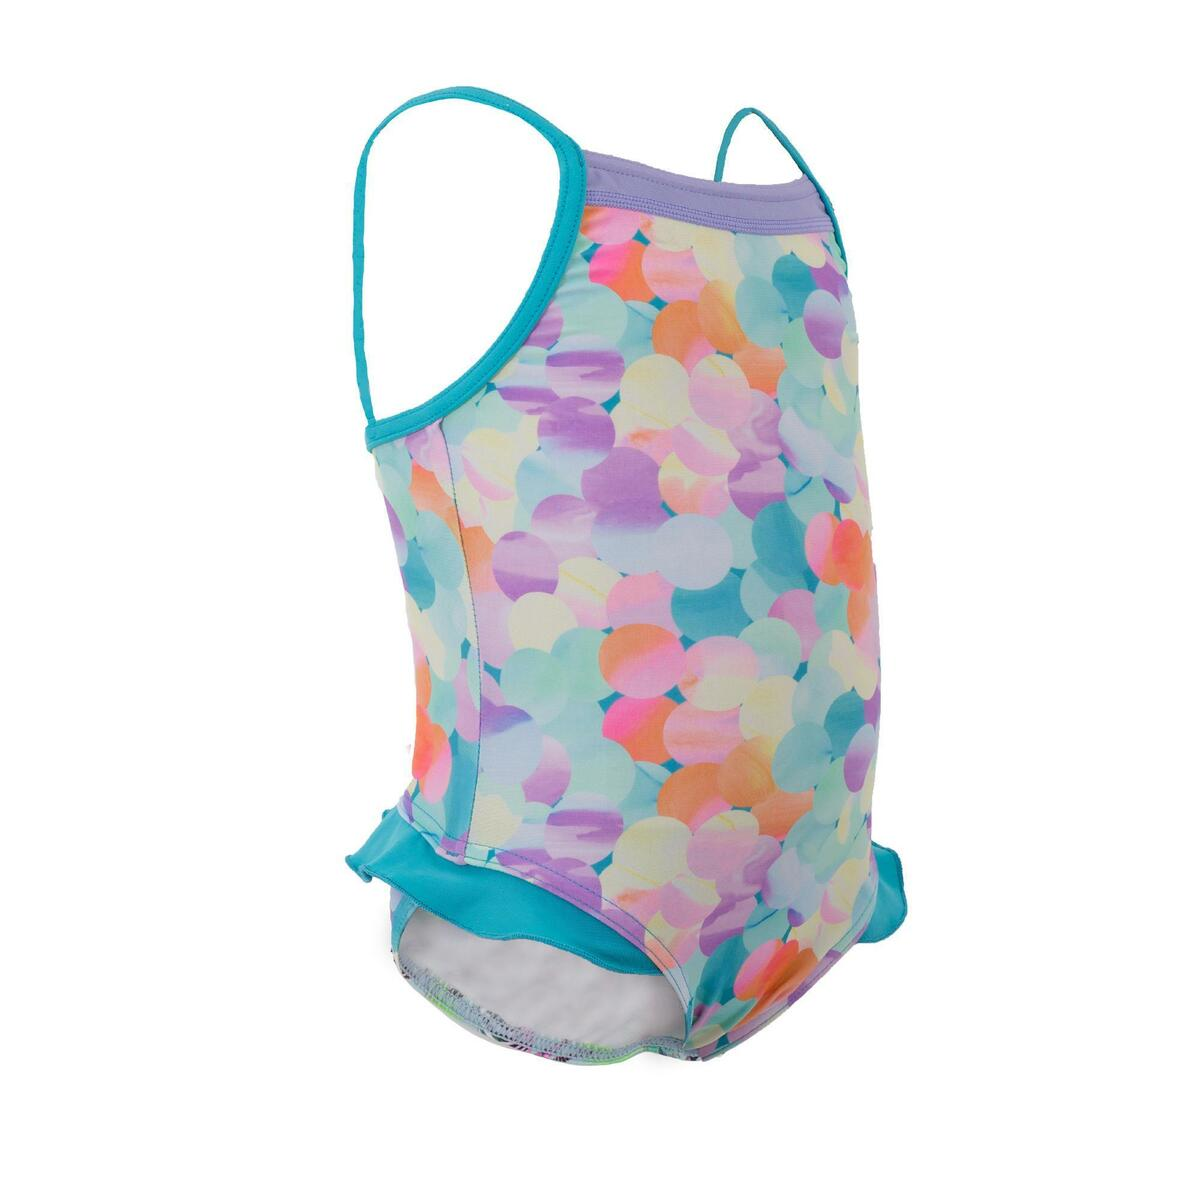 Bild 1 von Badeanzug Madina Baby Print hellblau